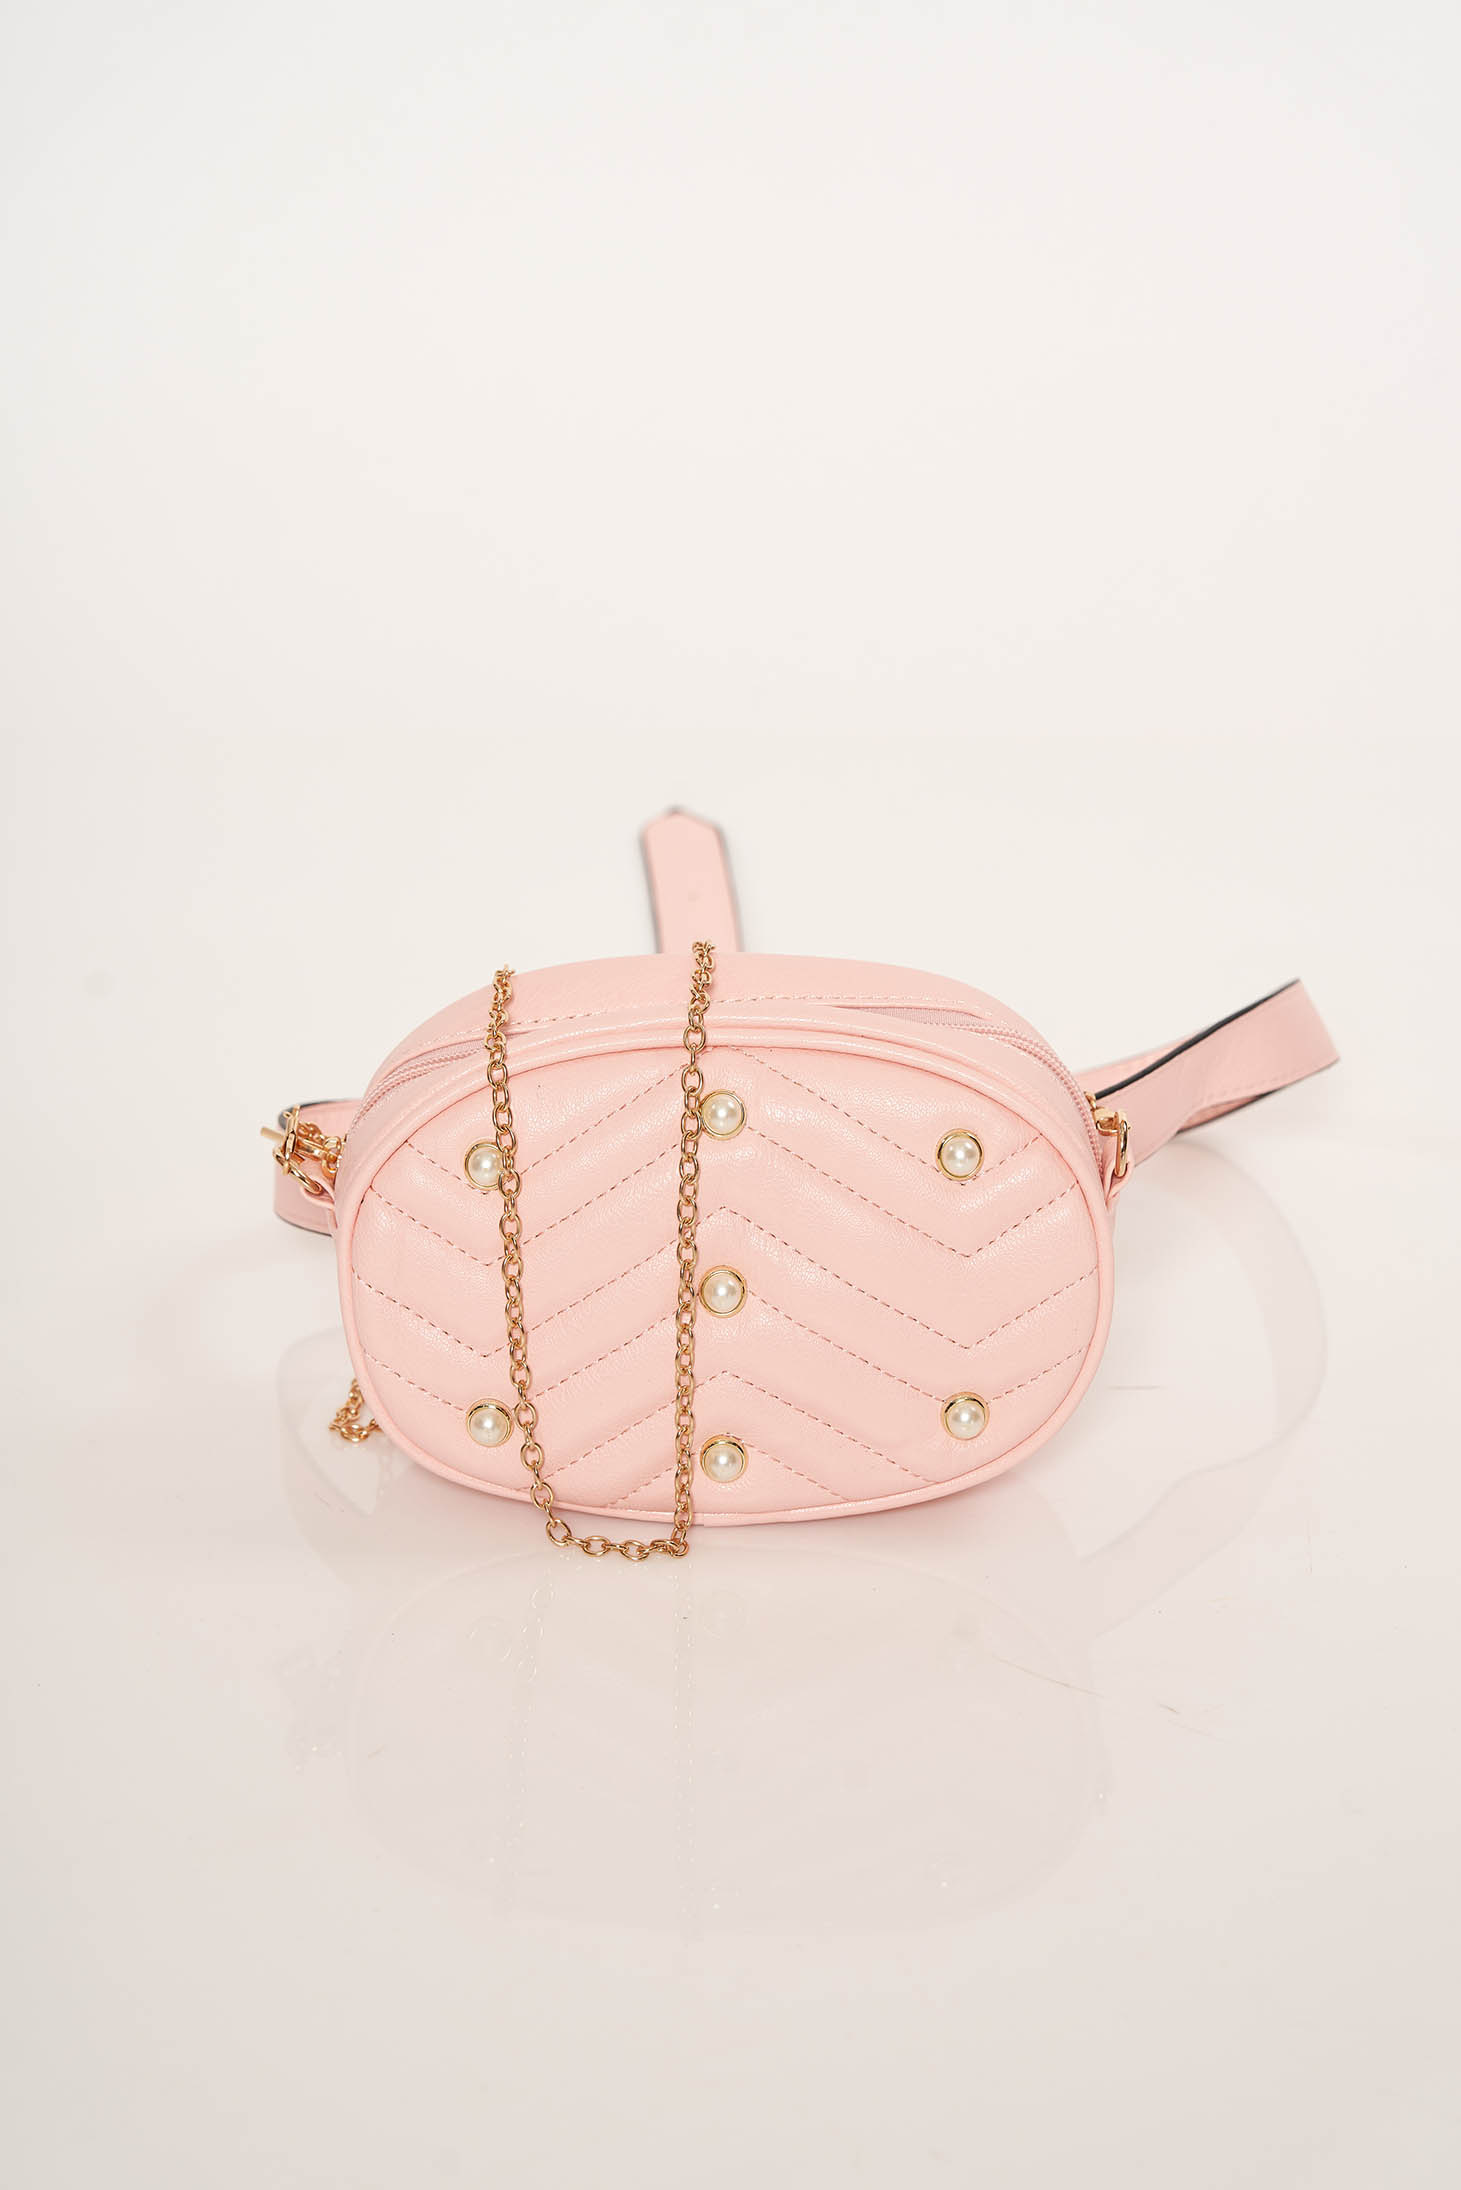 Geanta dama roz deschis tip borseta accesorizata cu lant metalic cu aplicatii cu margele din material matlasat